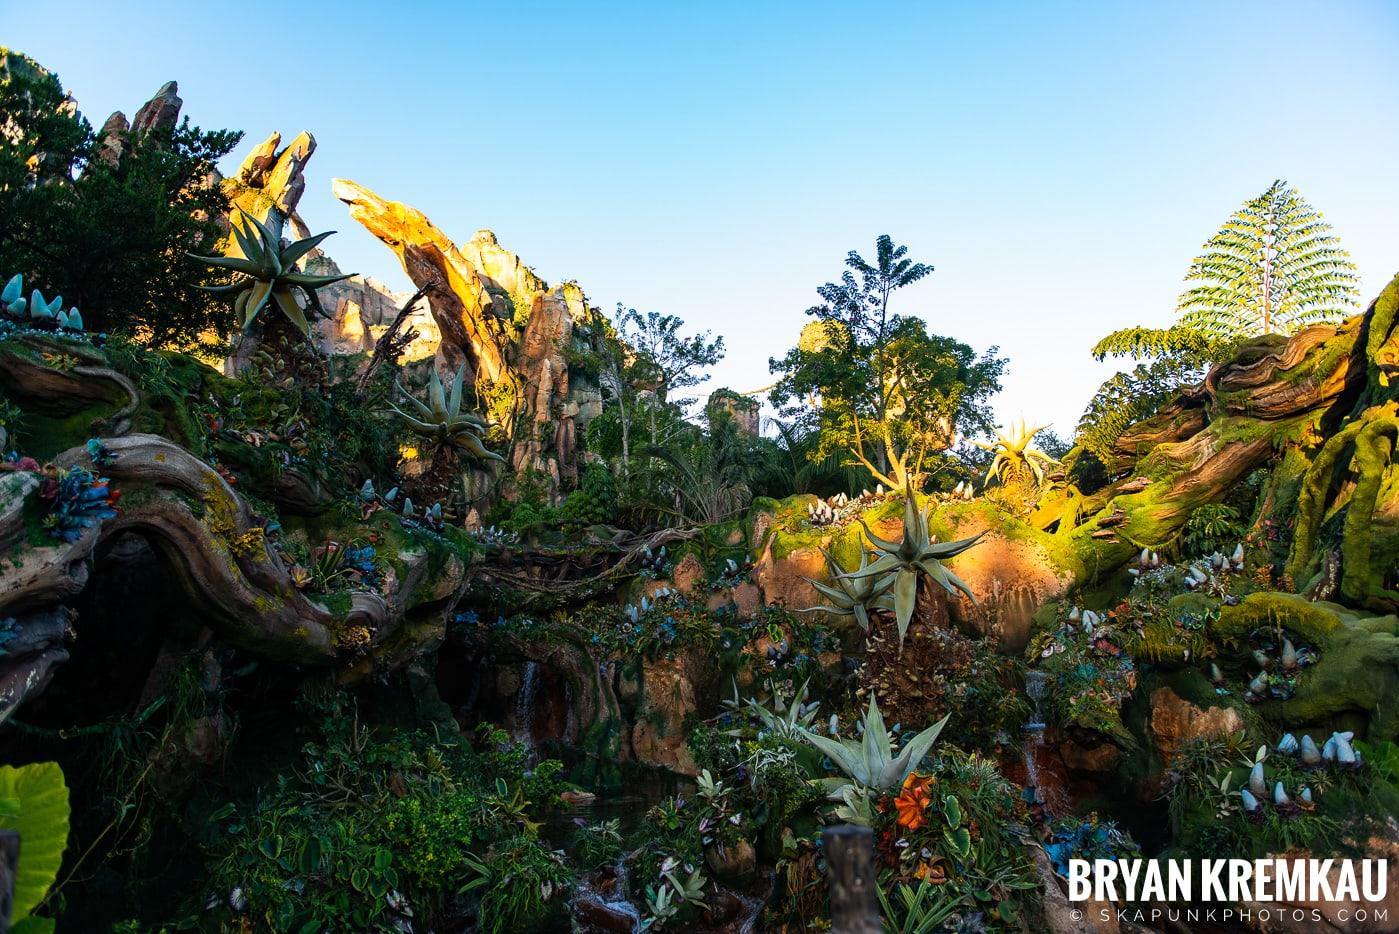 Walt Disney World Vacation: Day 5 (Animal Kingdom / Disney's Hollywood Studios) - 10.3.19 (77)